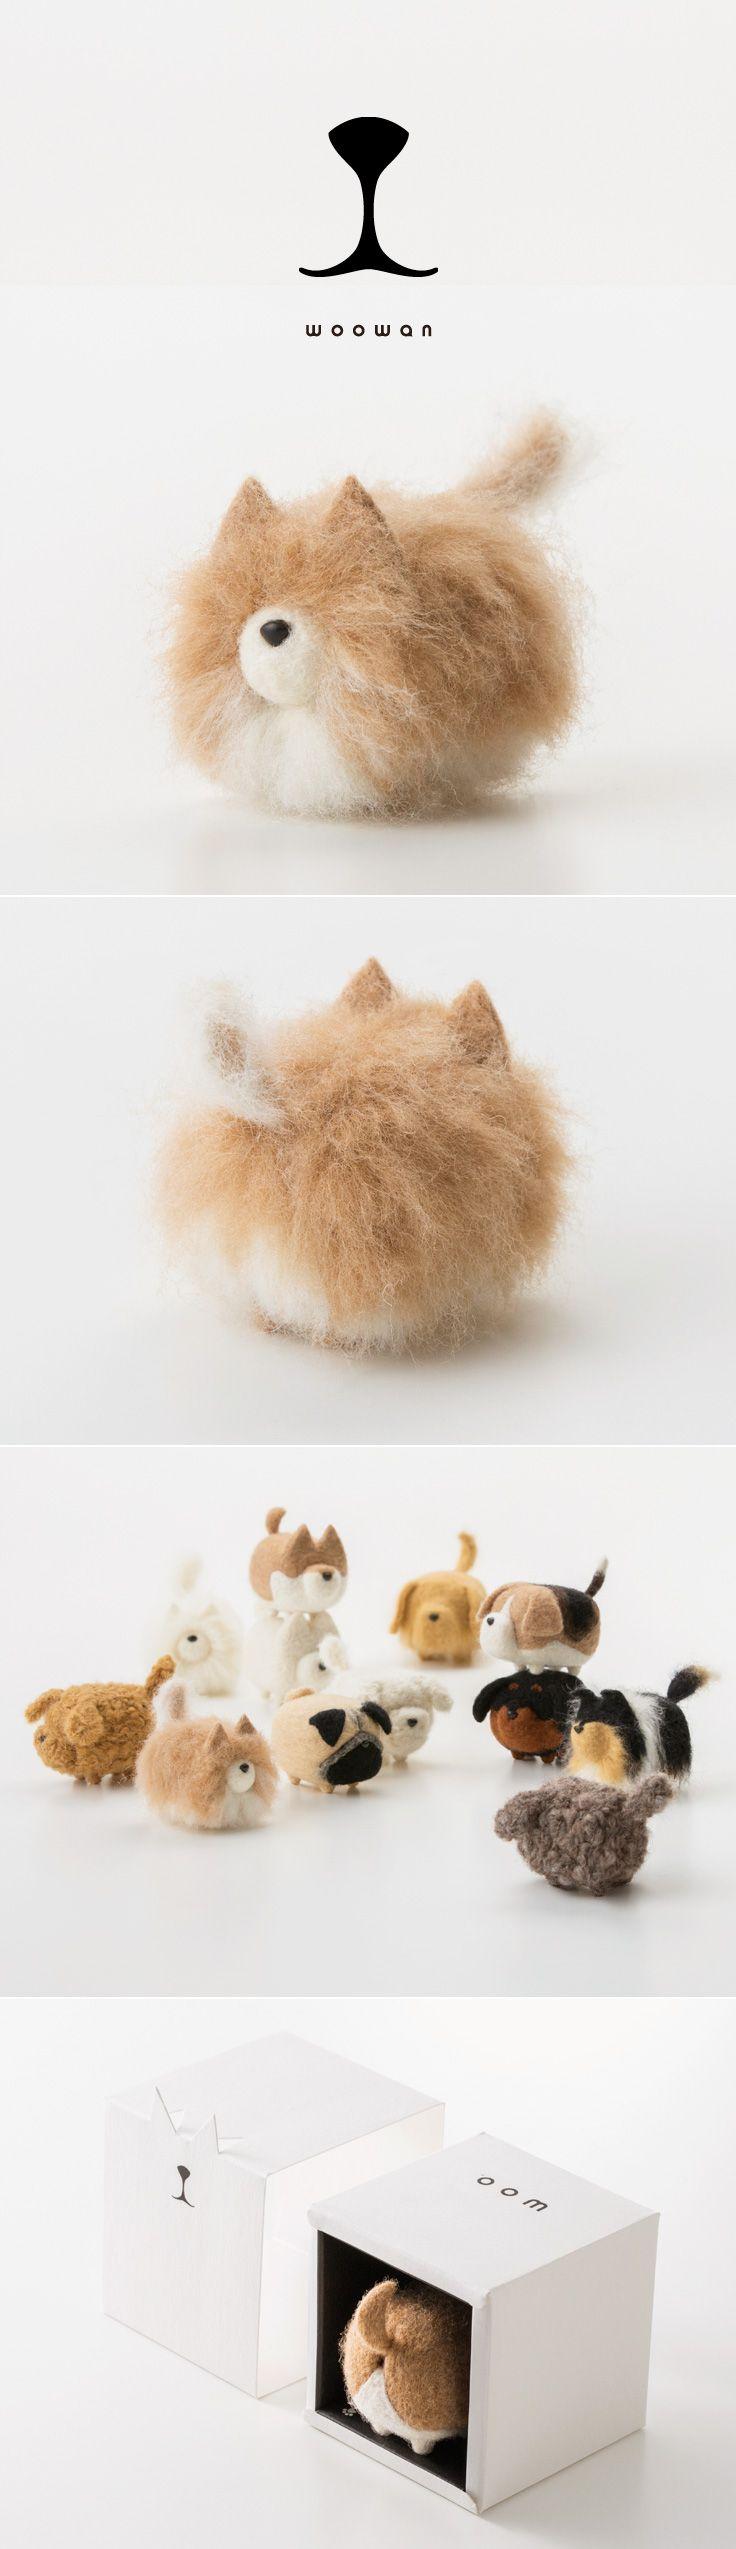 woowan/犬/dog/羊毛フェルト/Needle/Felting/mascot/doll/home/style/products/art/designs